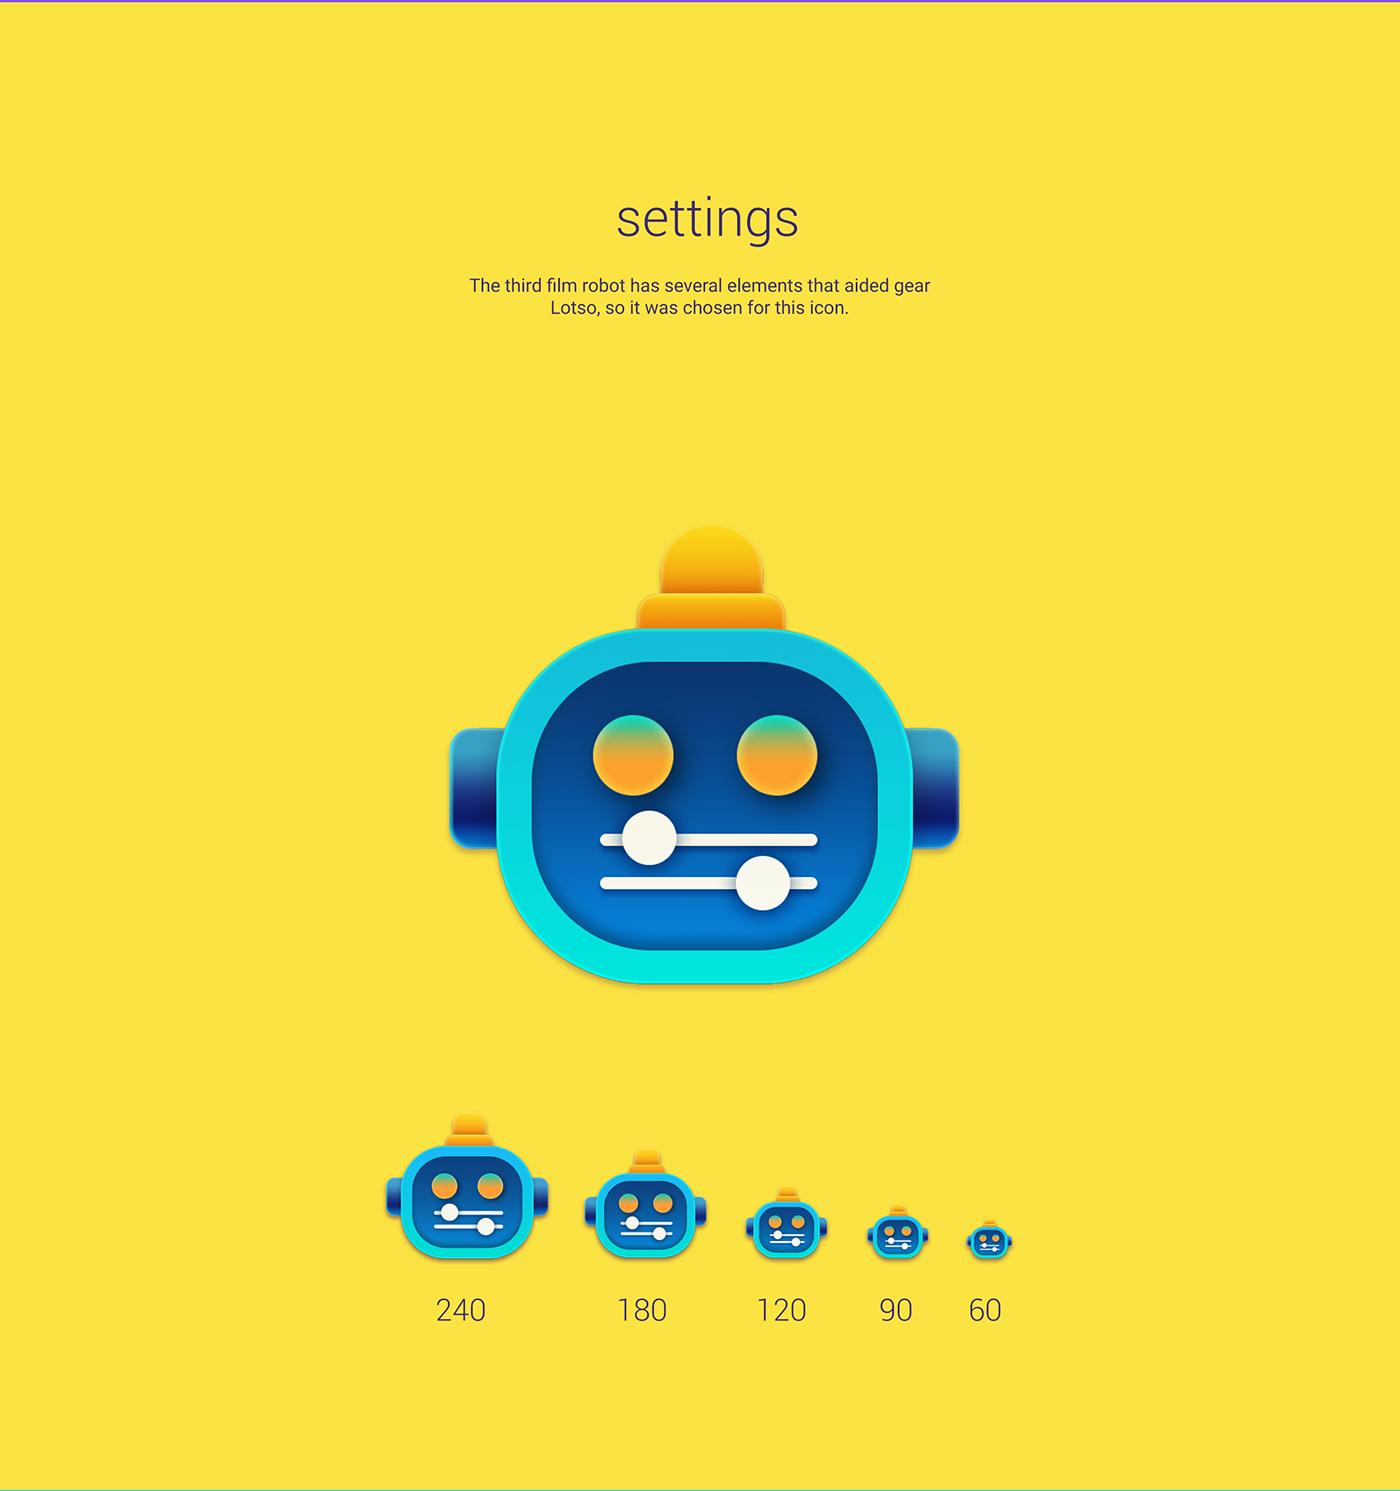 disney-pixar-toy-story-android-icons-leo-natsume-09